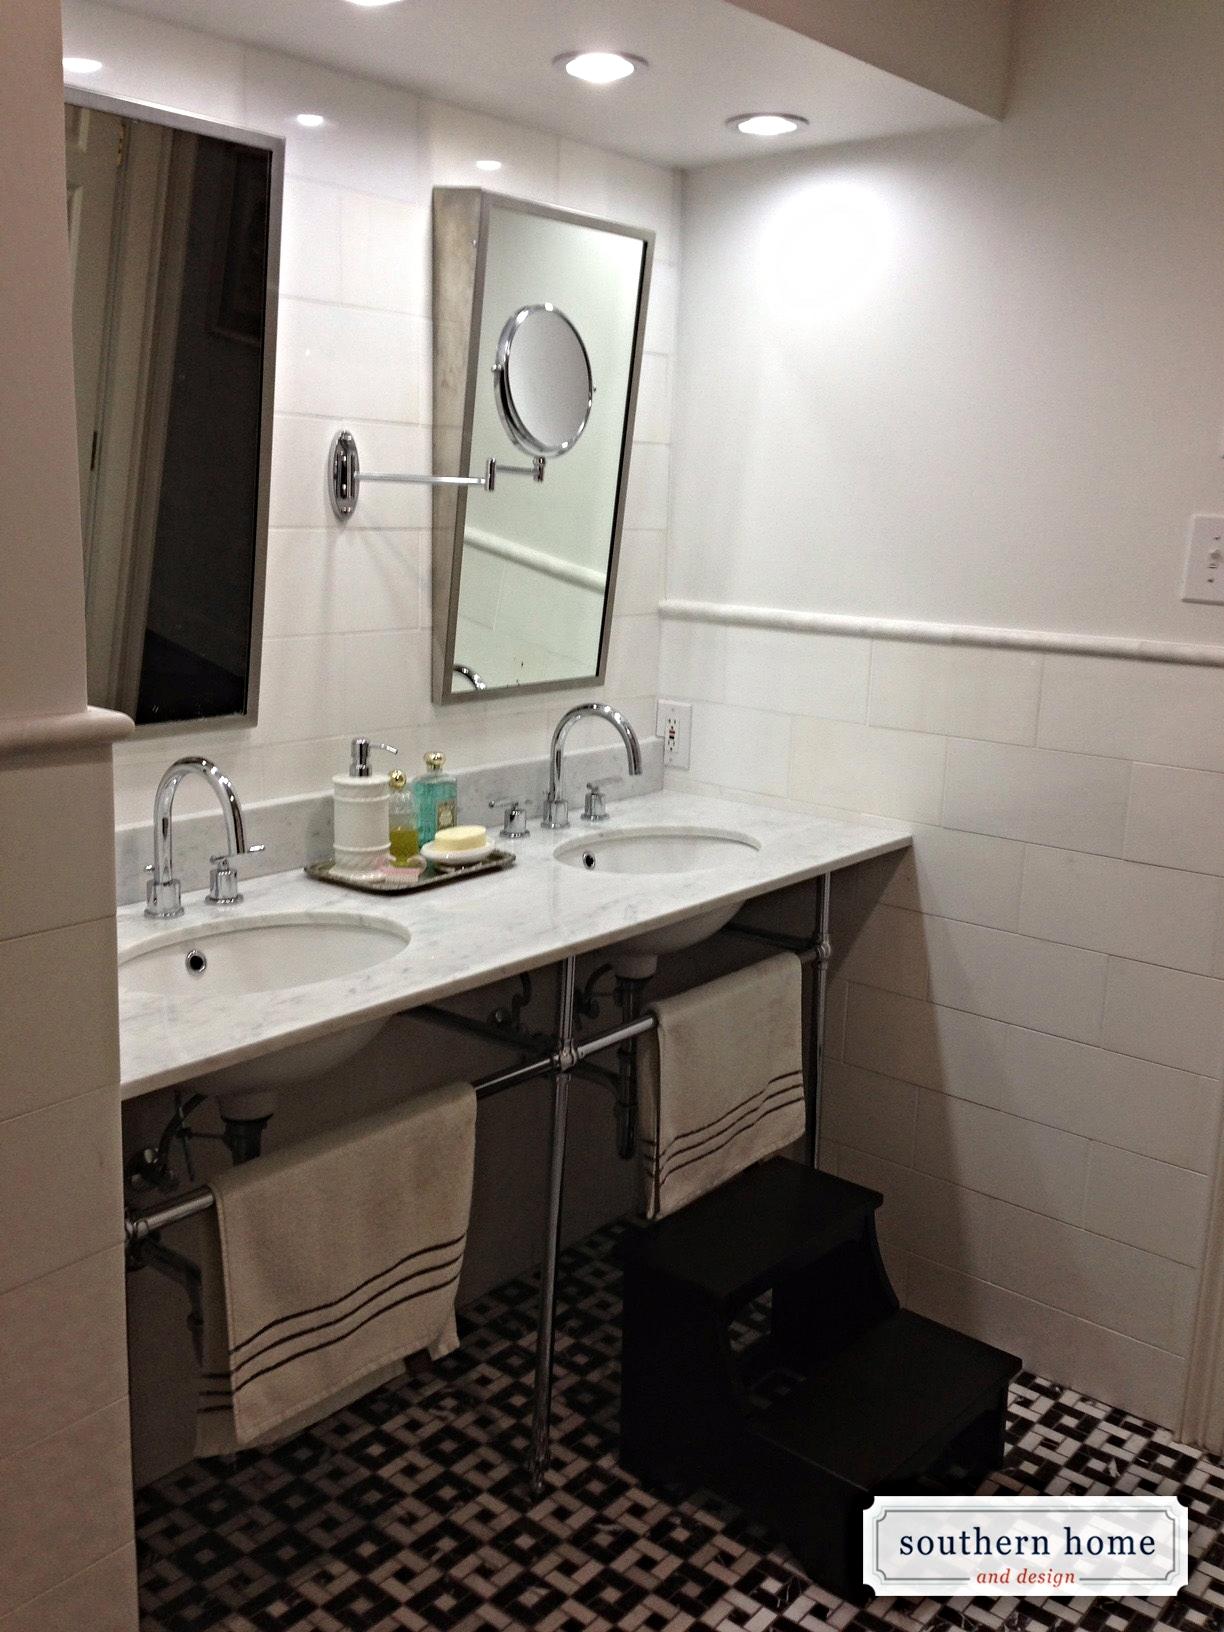 Modern, custom bathroom in Dallas. Angled mirrors, white sinks, and open design.